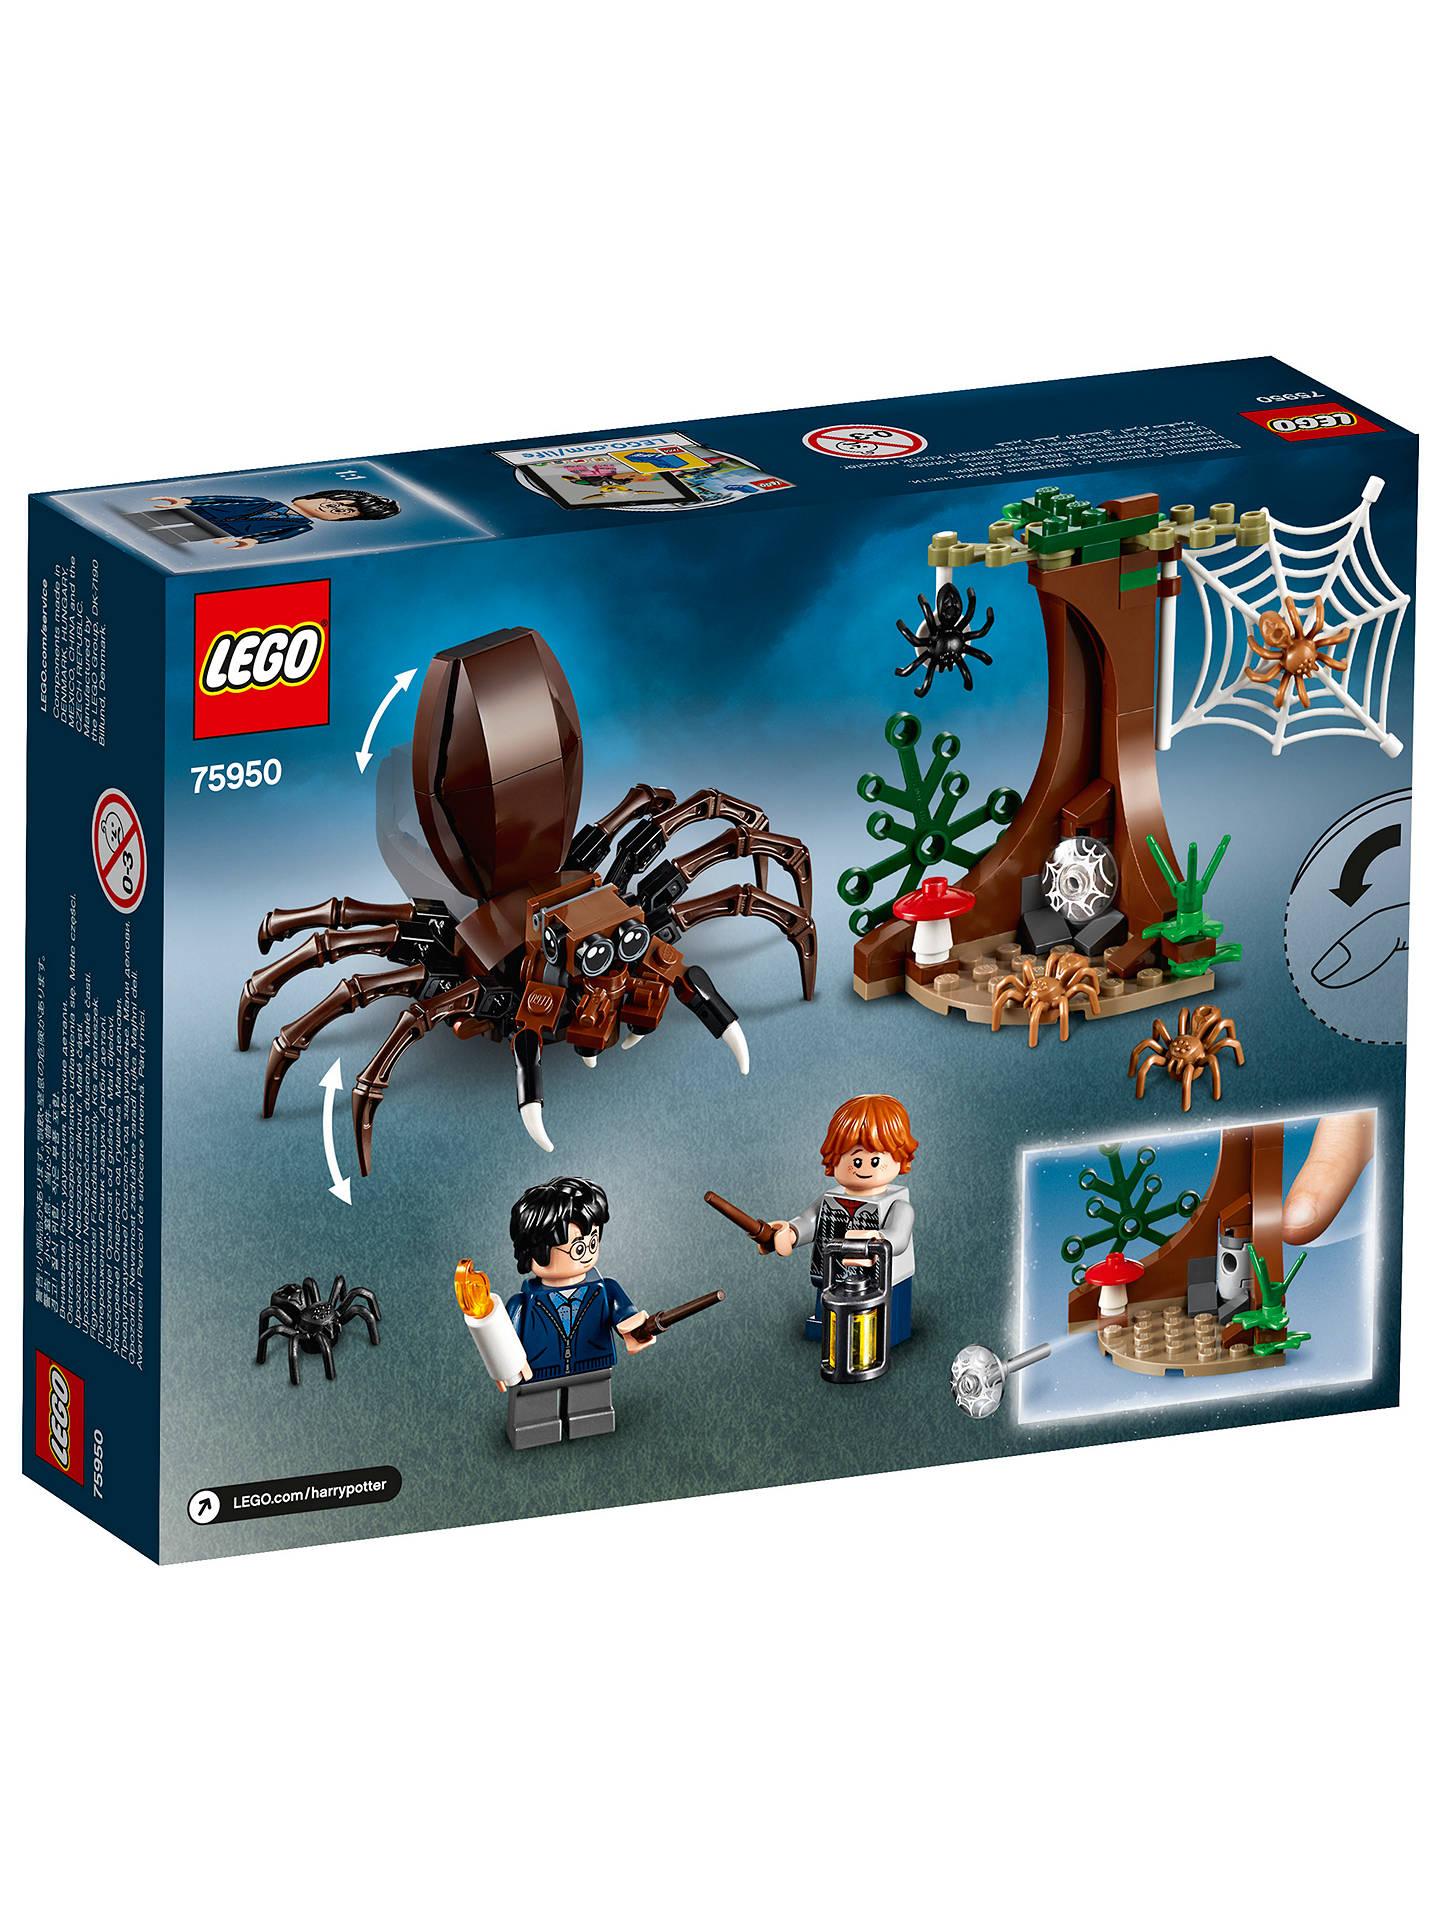 LEGO 75950 Harry Potter Aragog\'s Lair at John Lewis & Partners